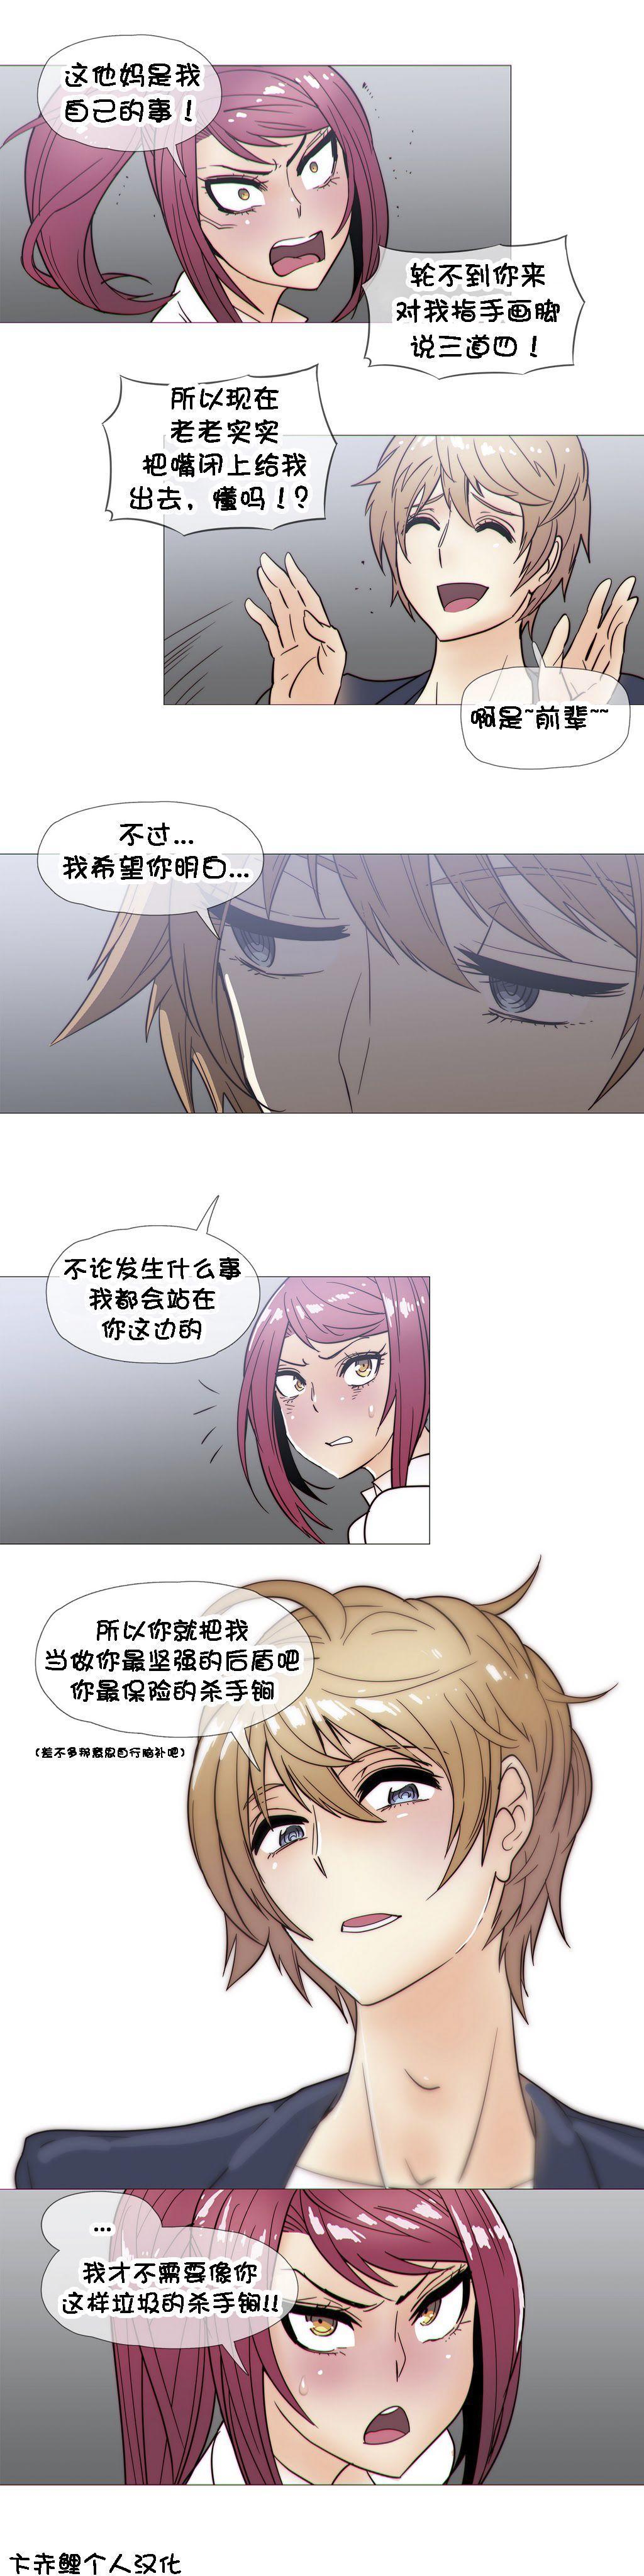 HouseHold Affairs 【卞赤鲤个人汉化】1~33话(持续更新中) 558